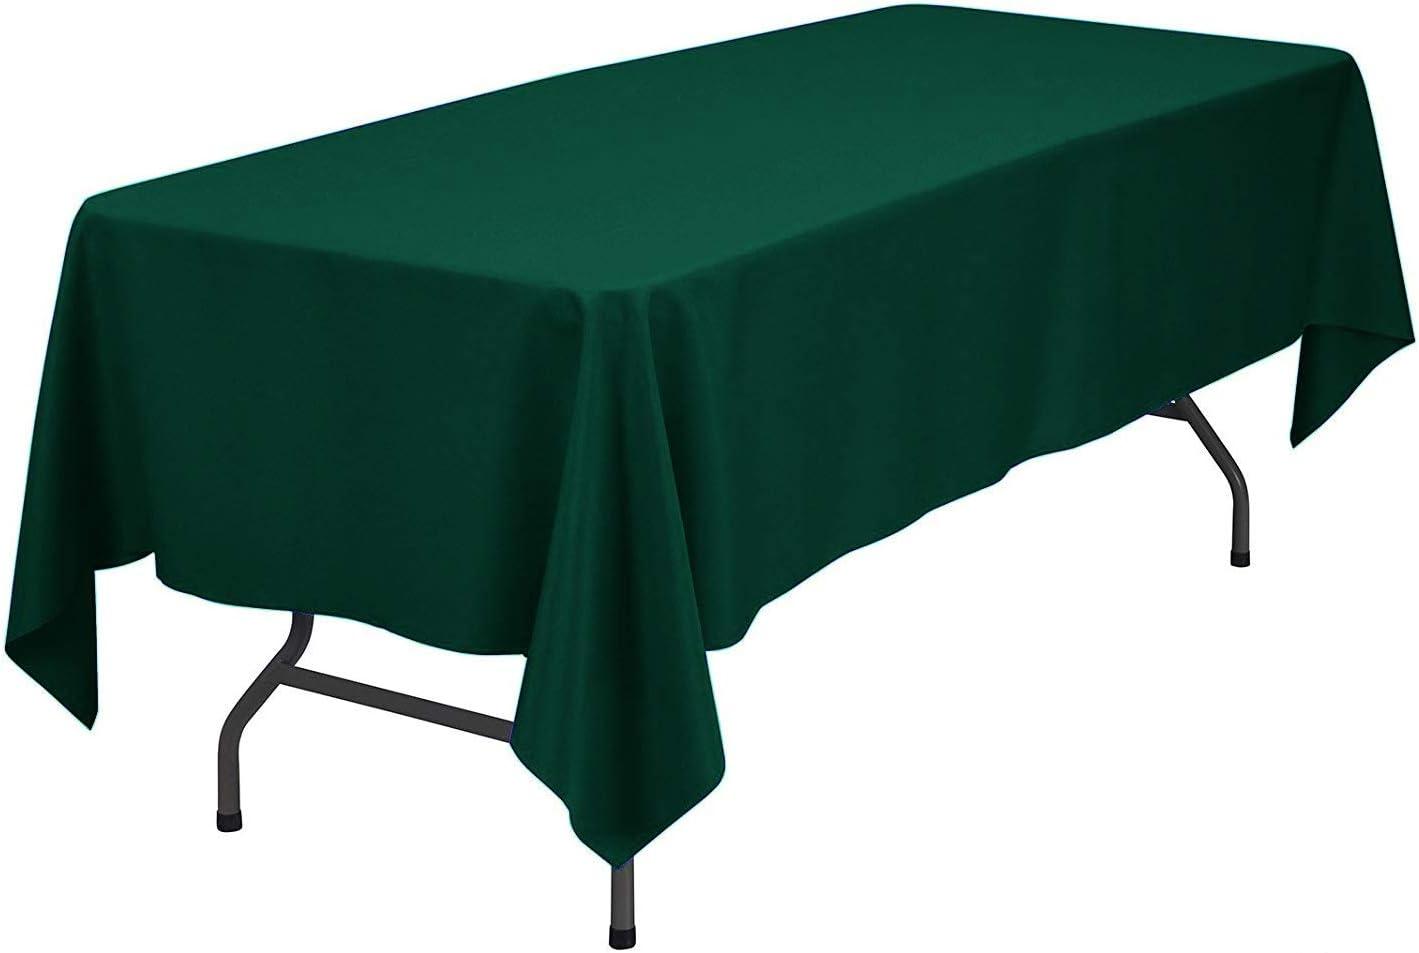 Sunnolimit Rectangle Tablecloth - 60 x 102